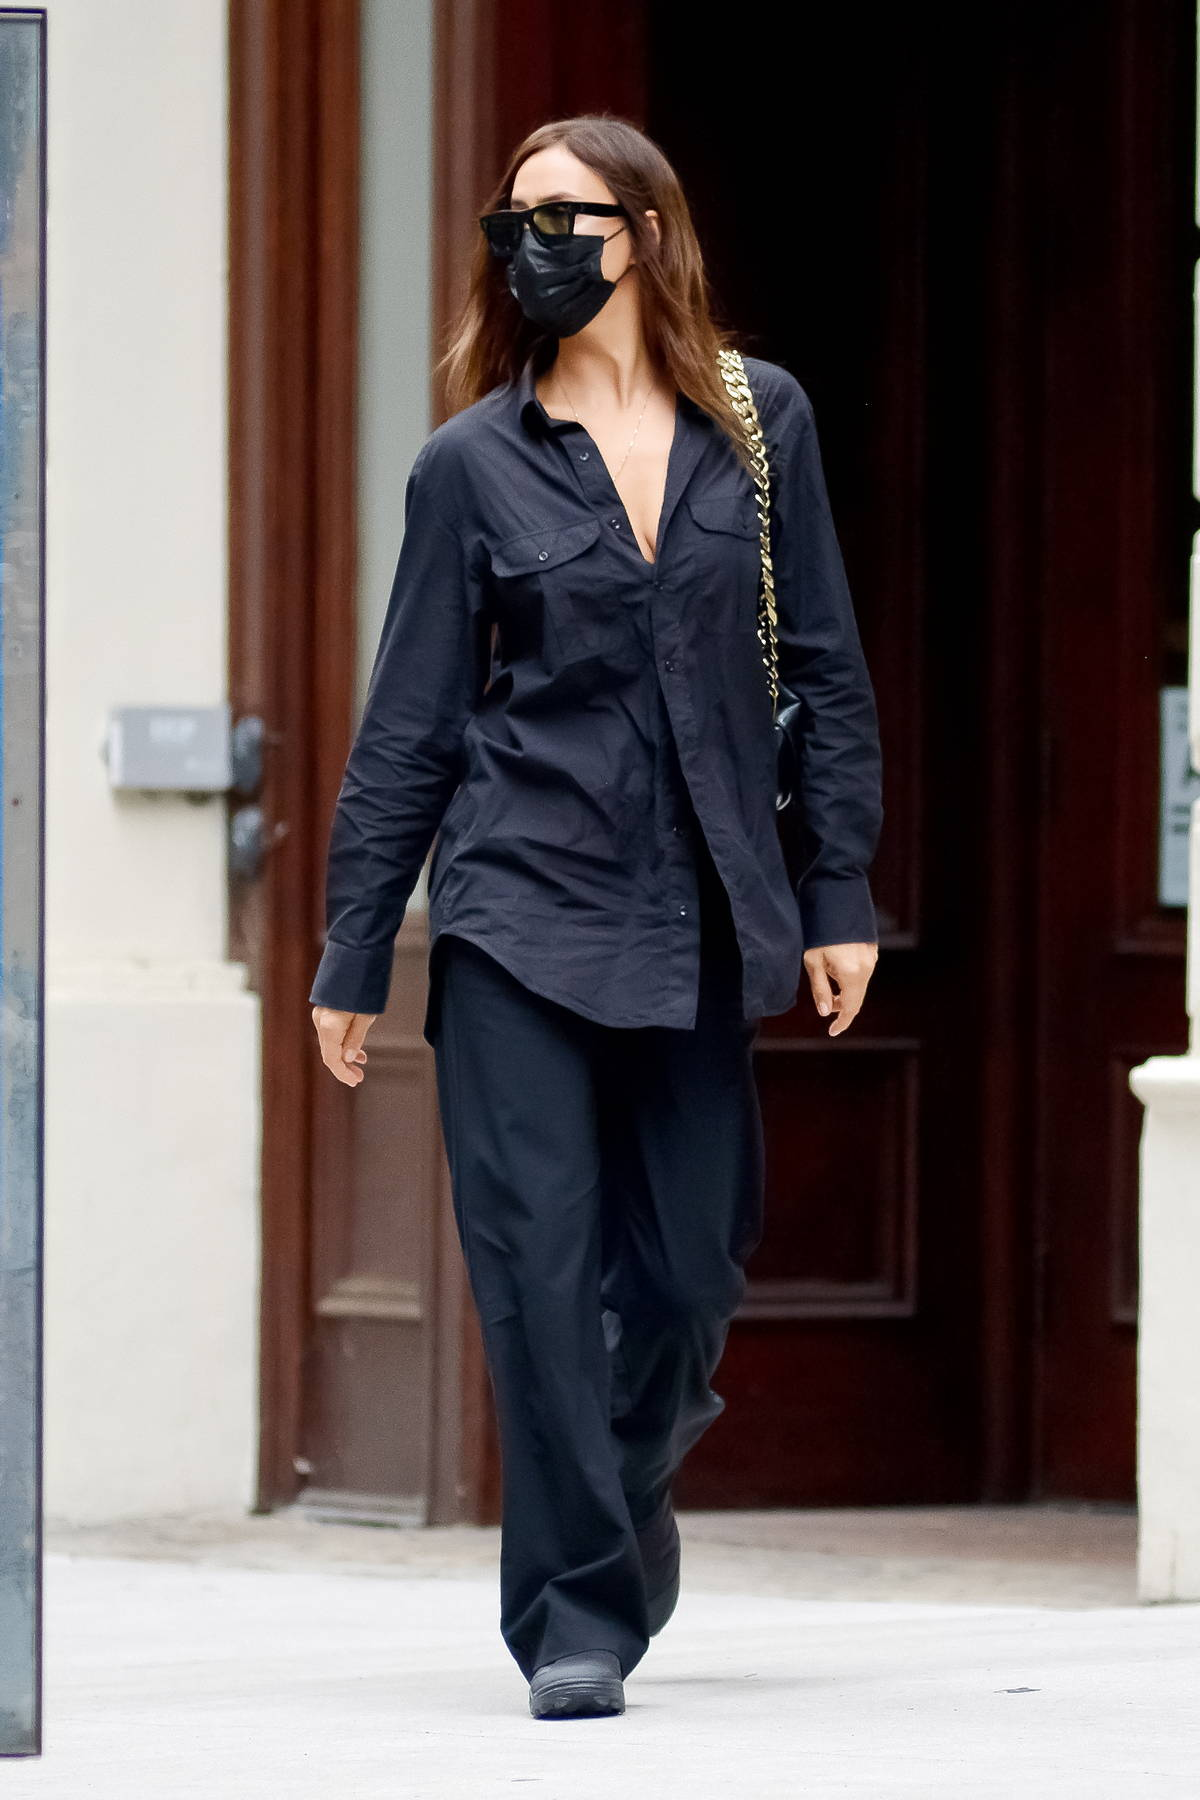 Irina Shayk looks striking in all-black while running errands in New York City